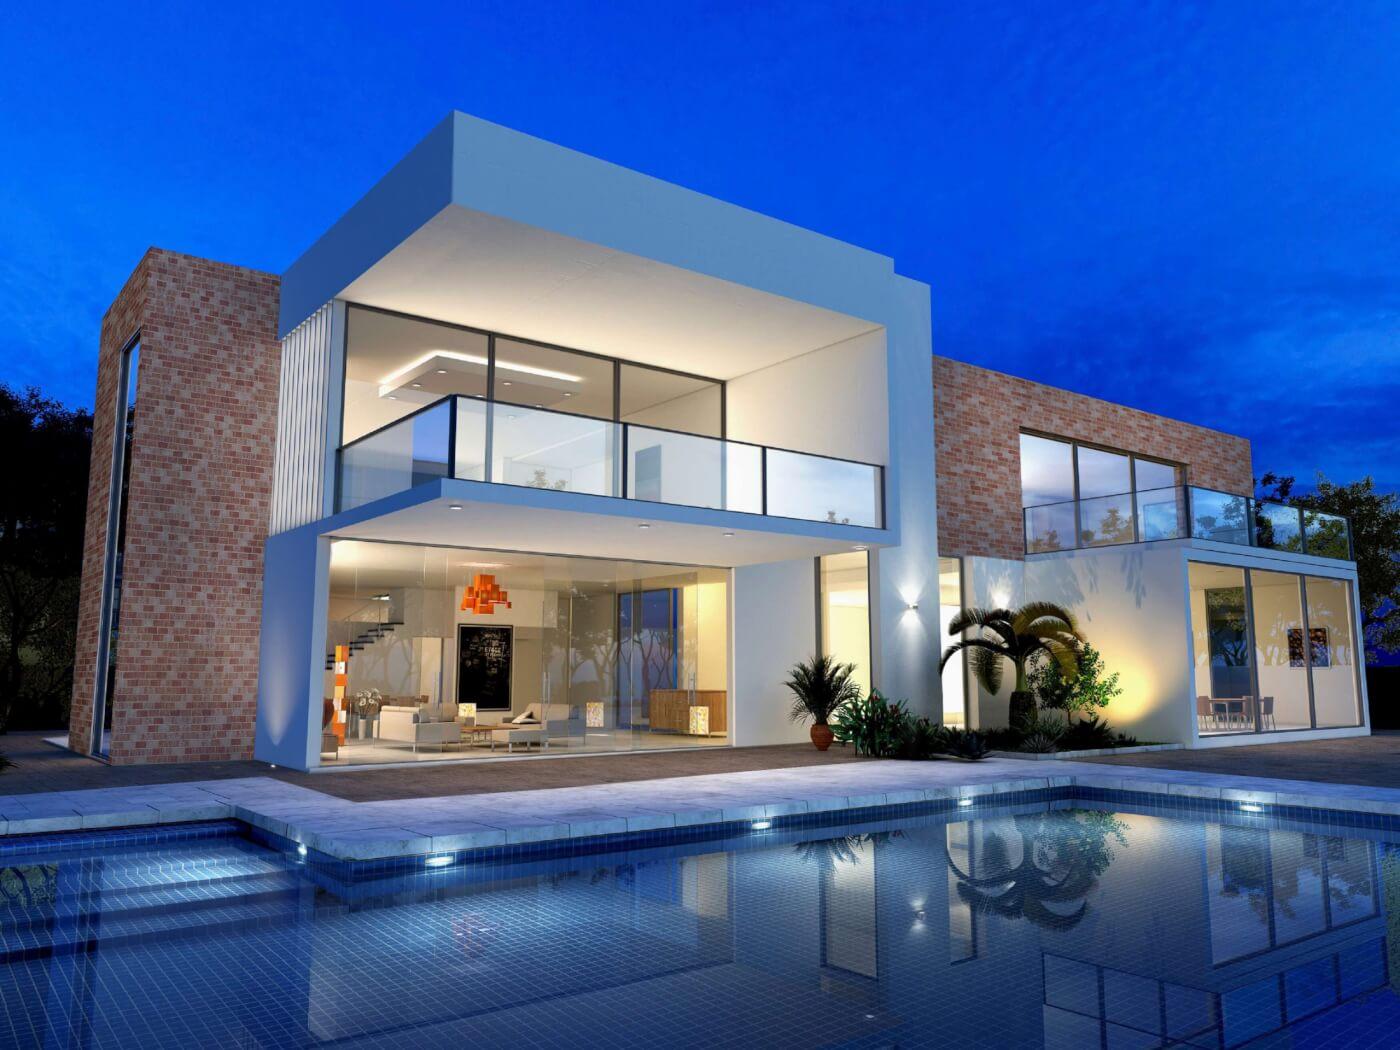 Blush Brick Modern Mansion with pool